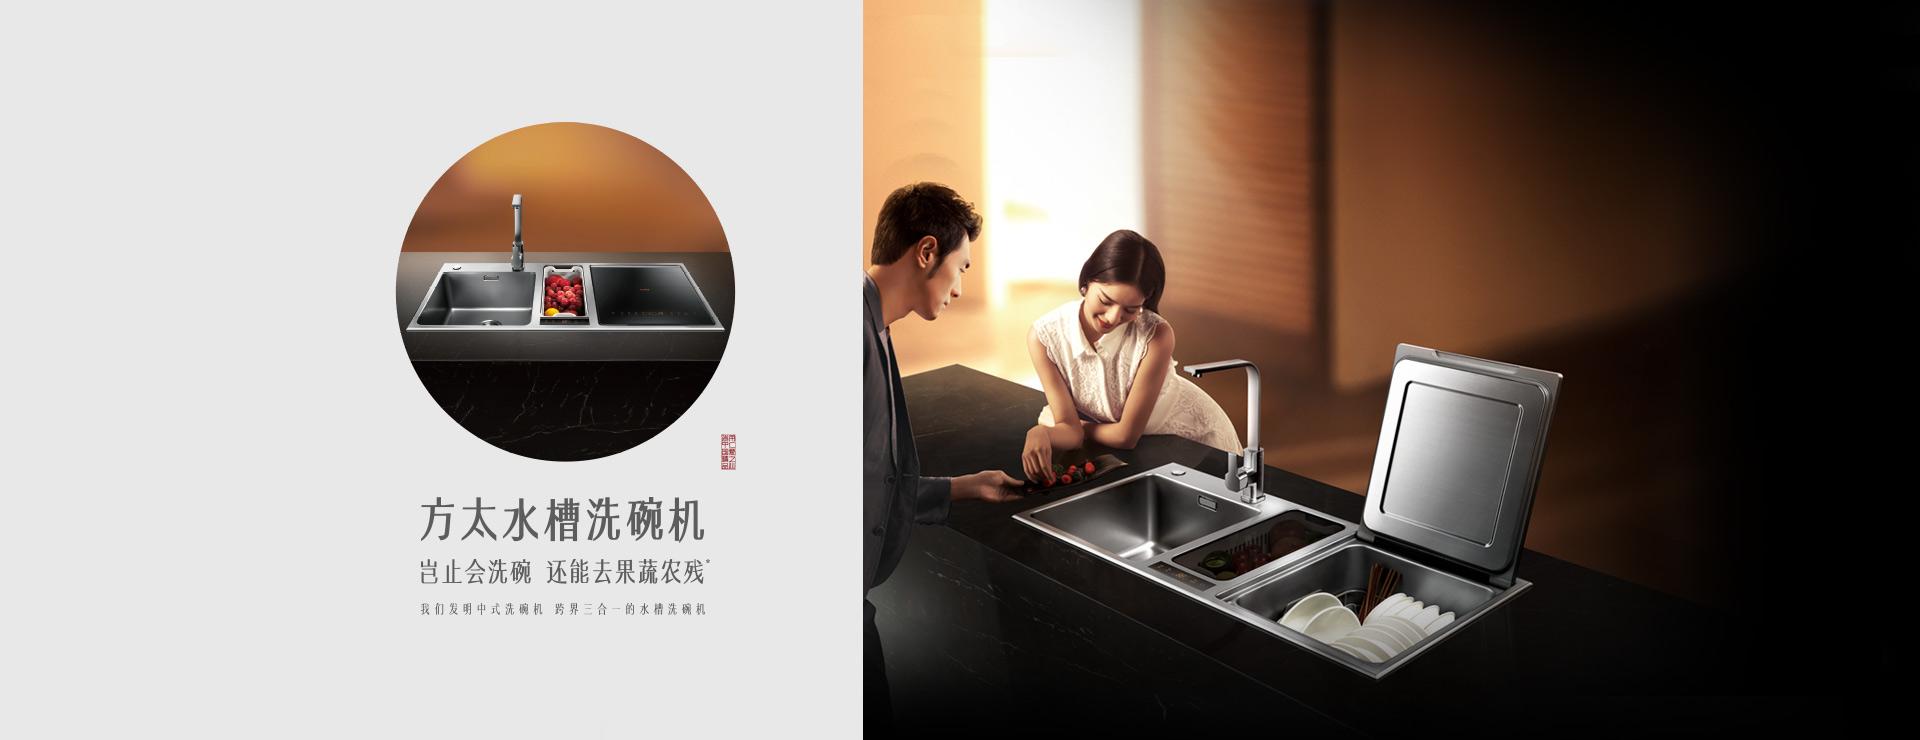 LadBrokes中文网水槽洗碗机